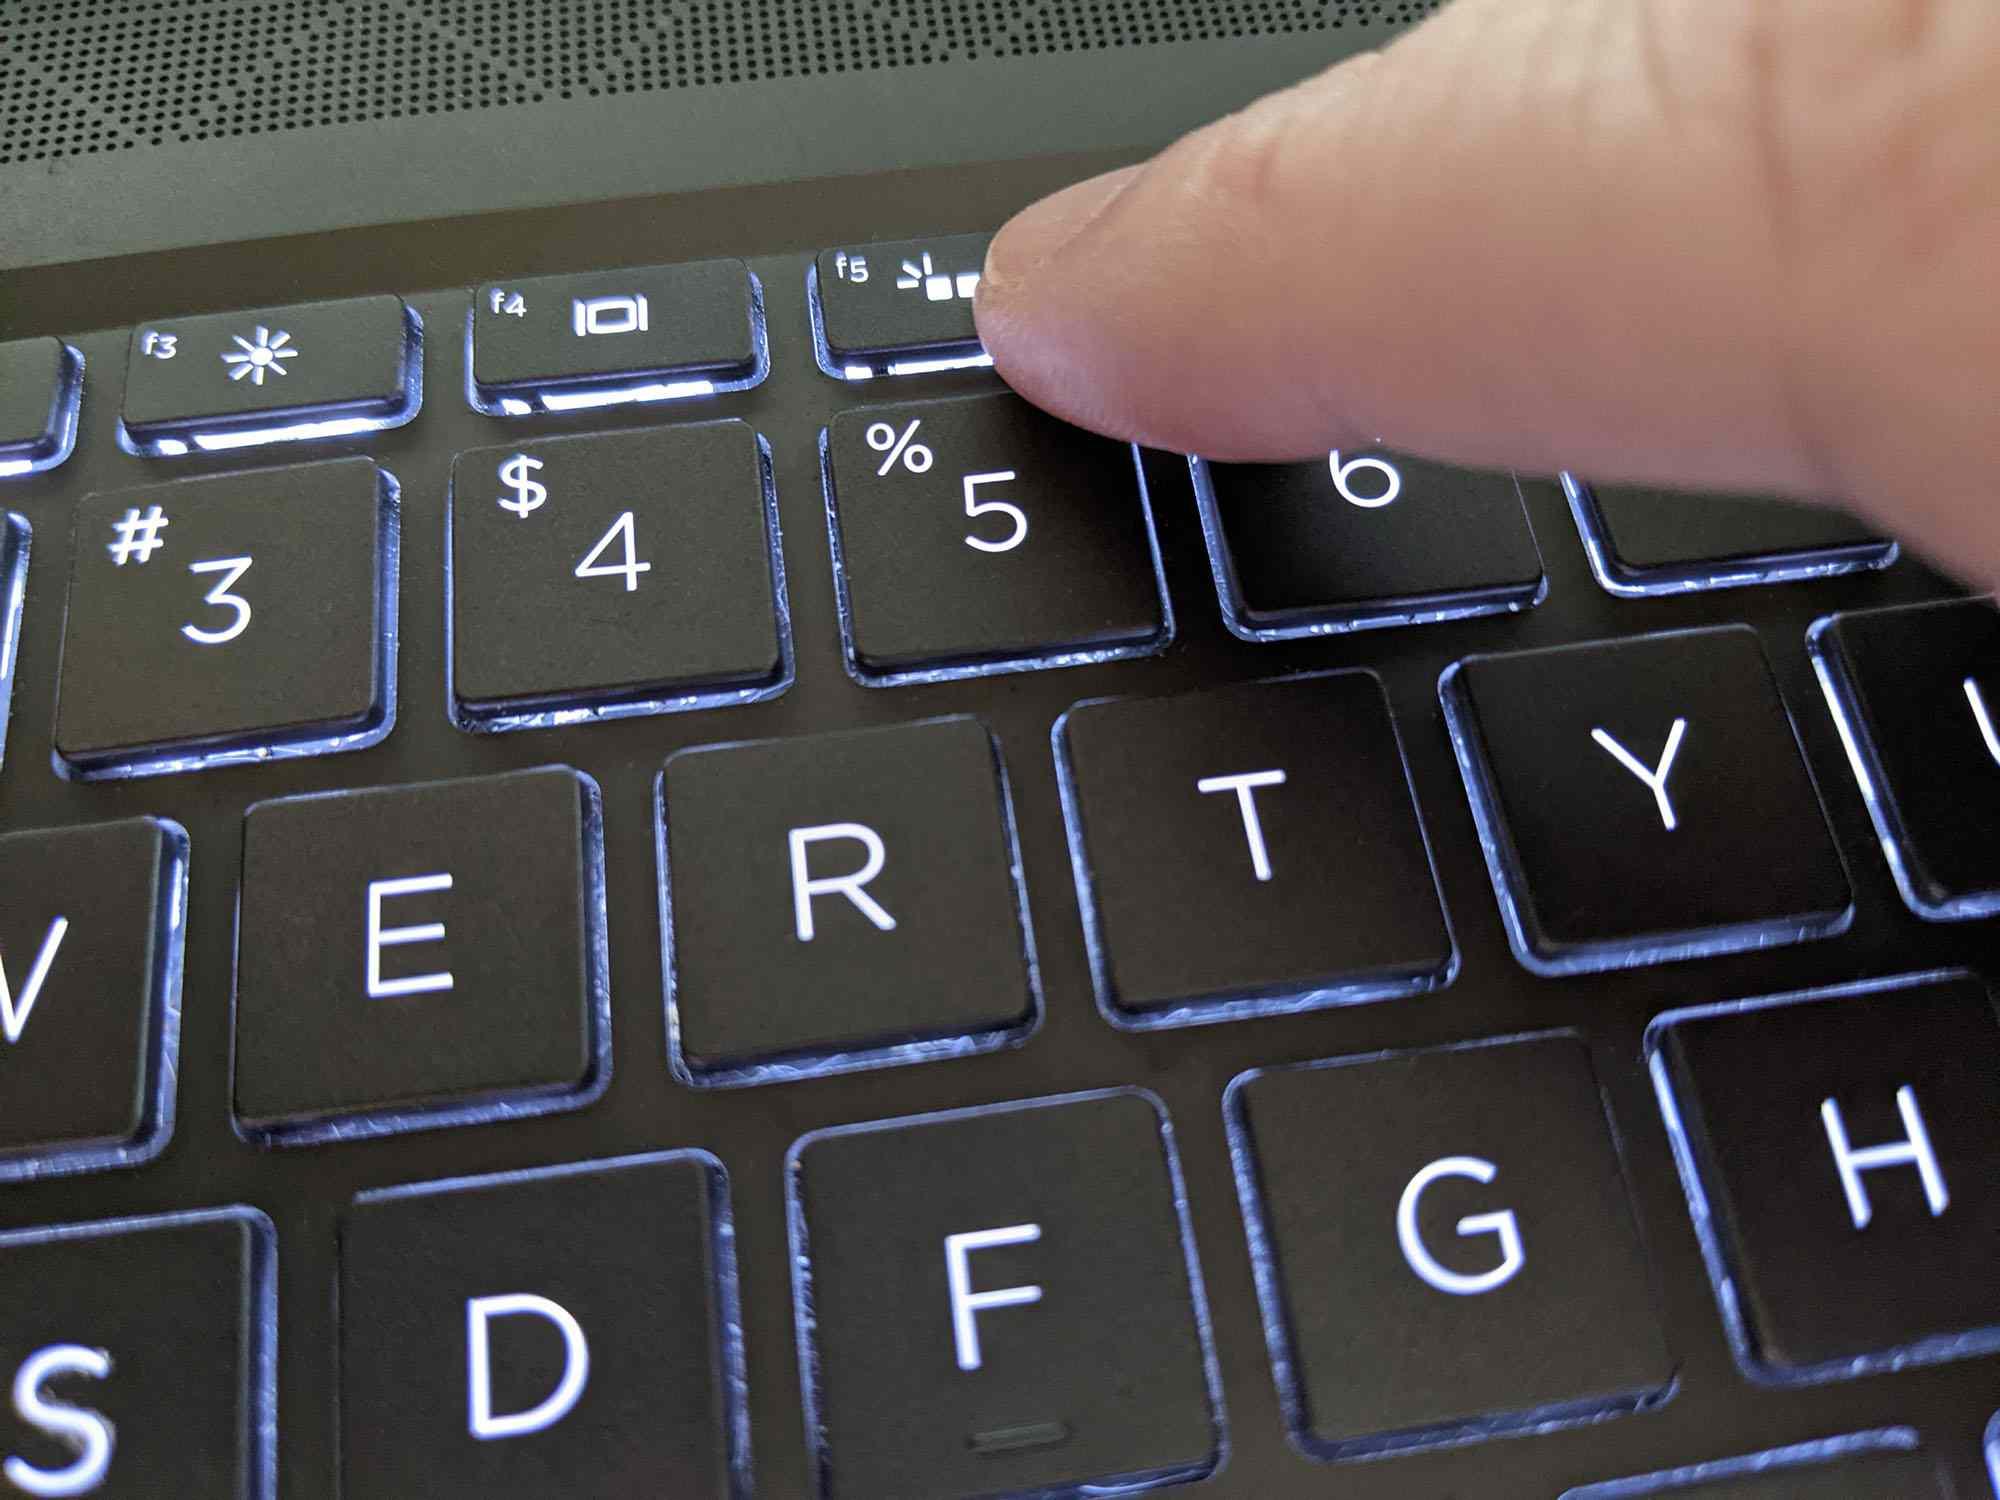 Adjusting the brightness of a keyboard light.